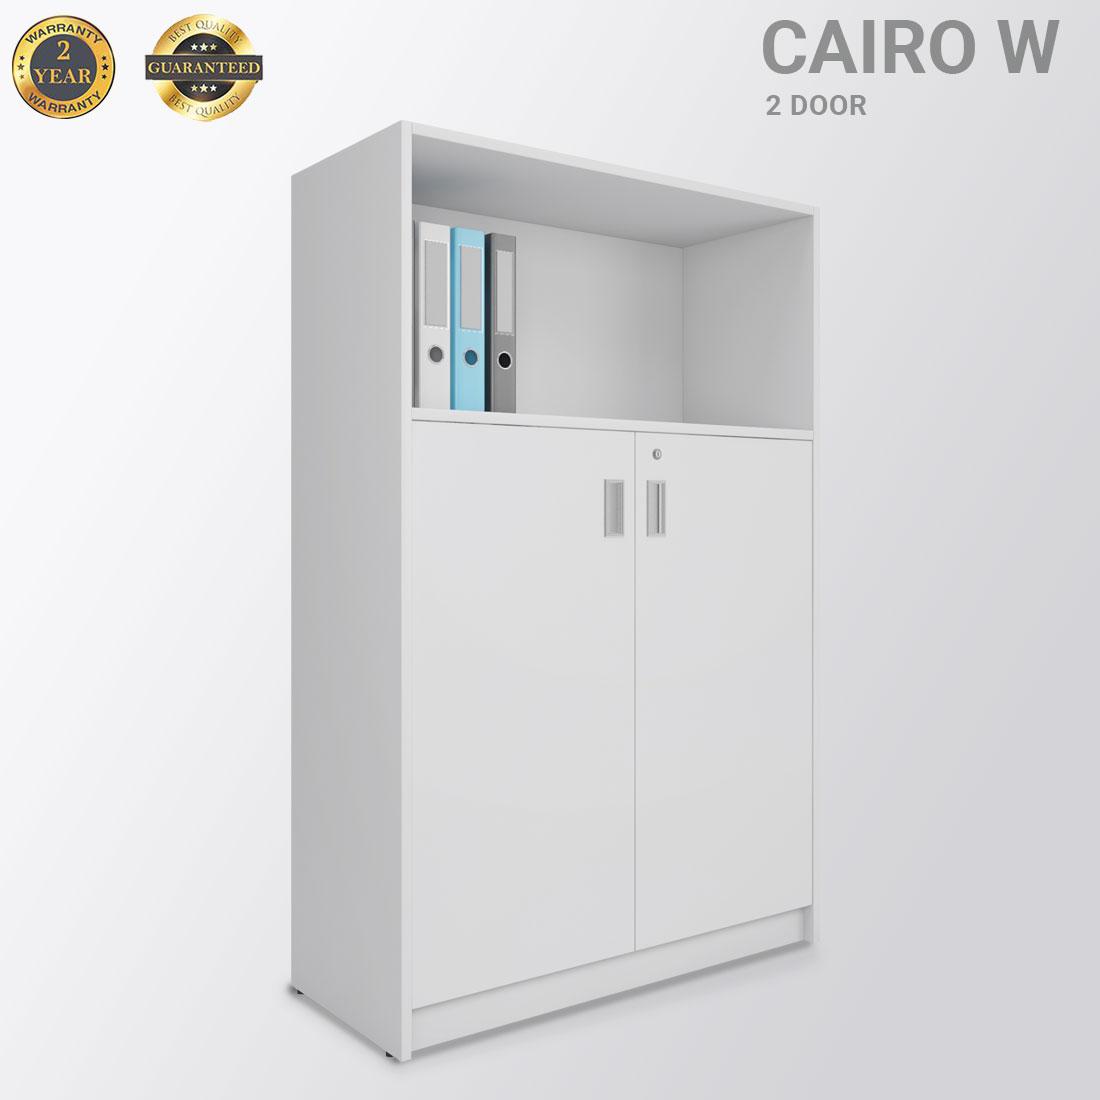 CAIRO W